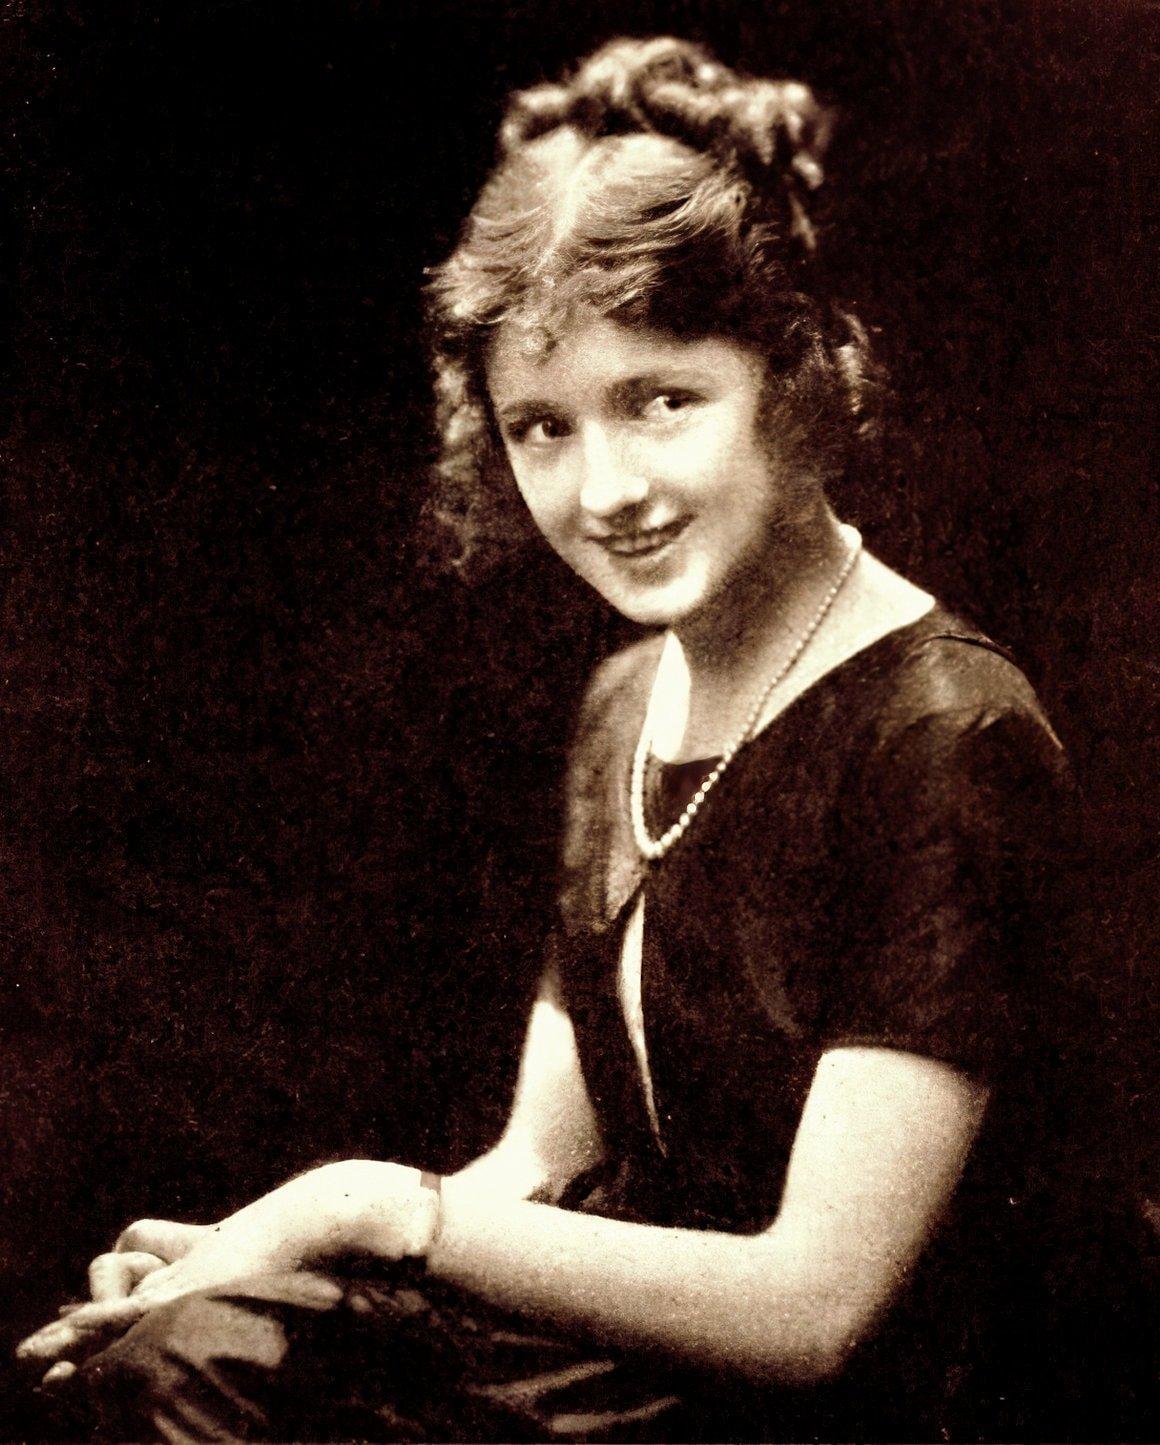 Vintage actress Vivian Martin in 1920